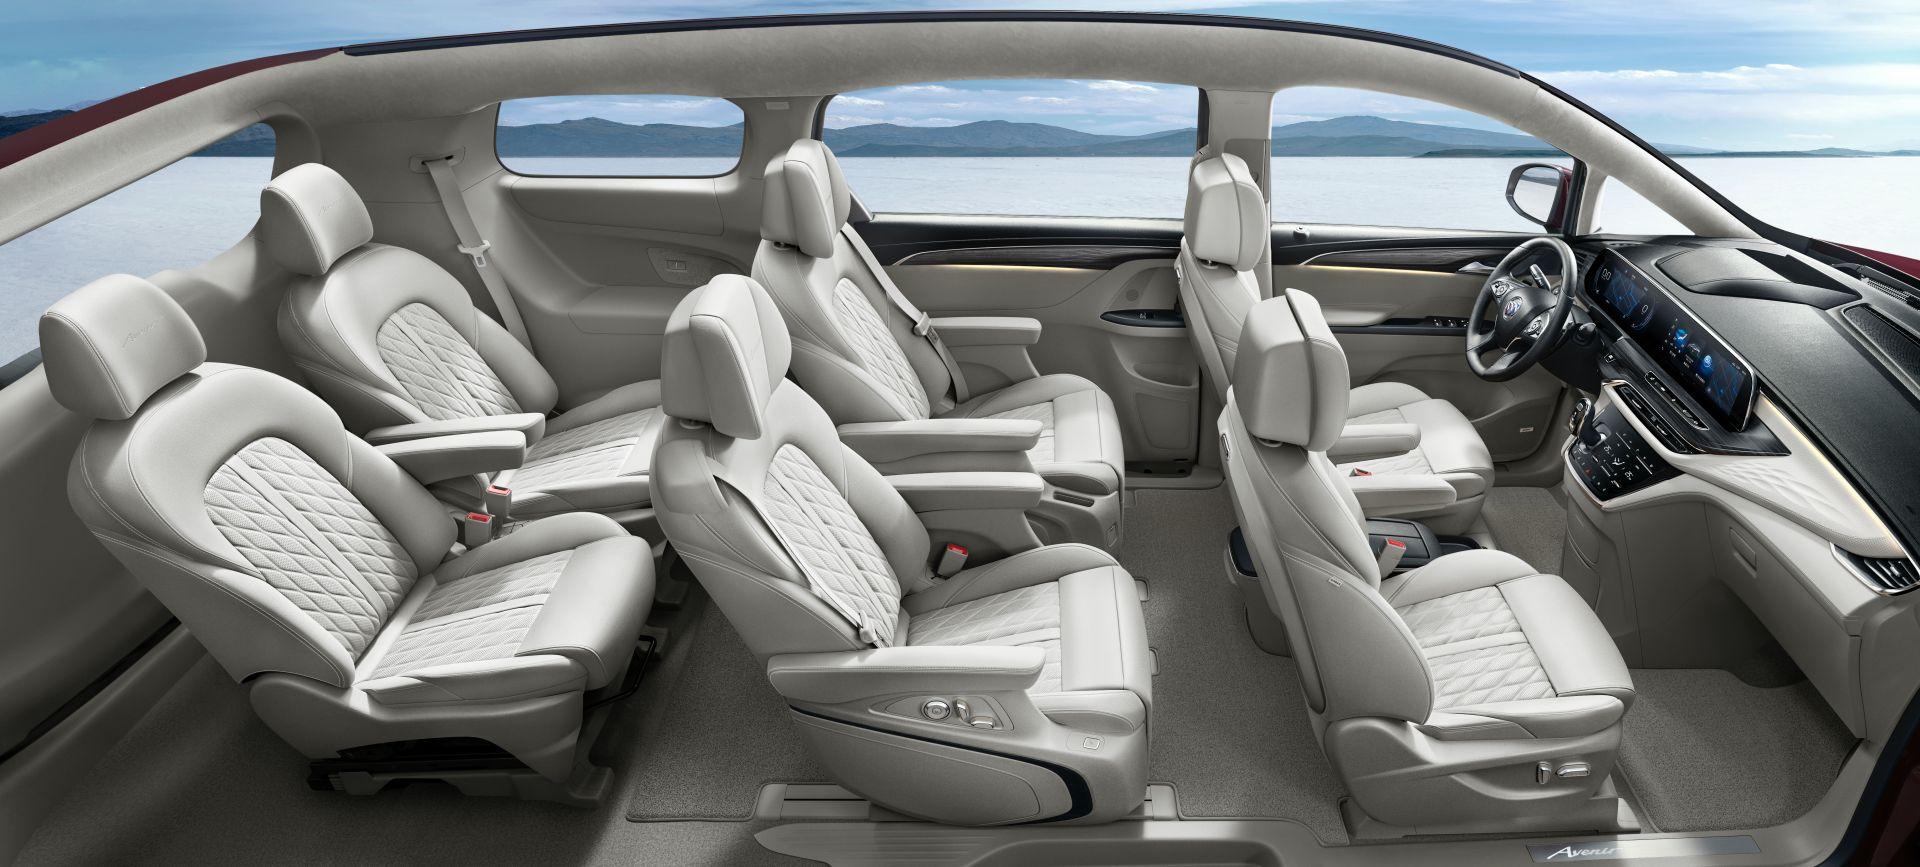 2020-Buick-GL8-Avenir-China-spec-5